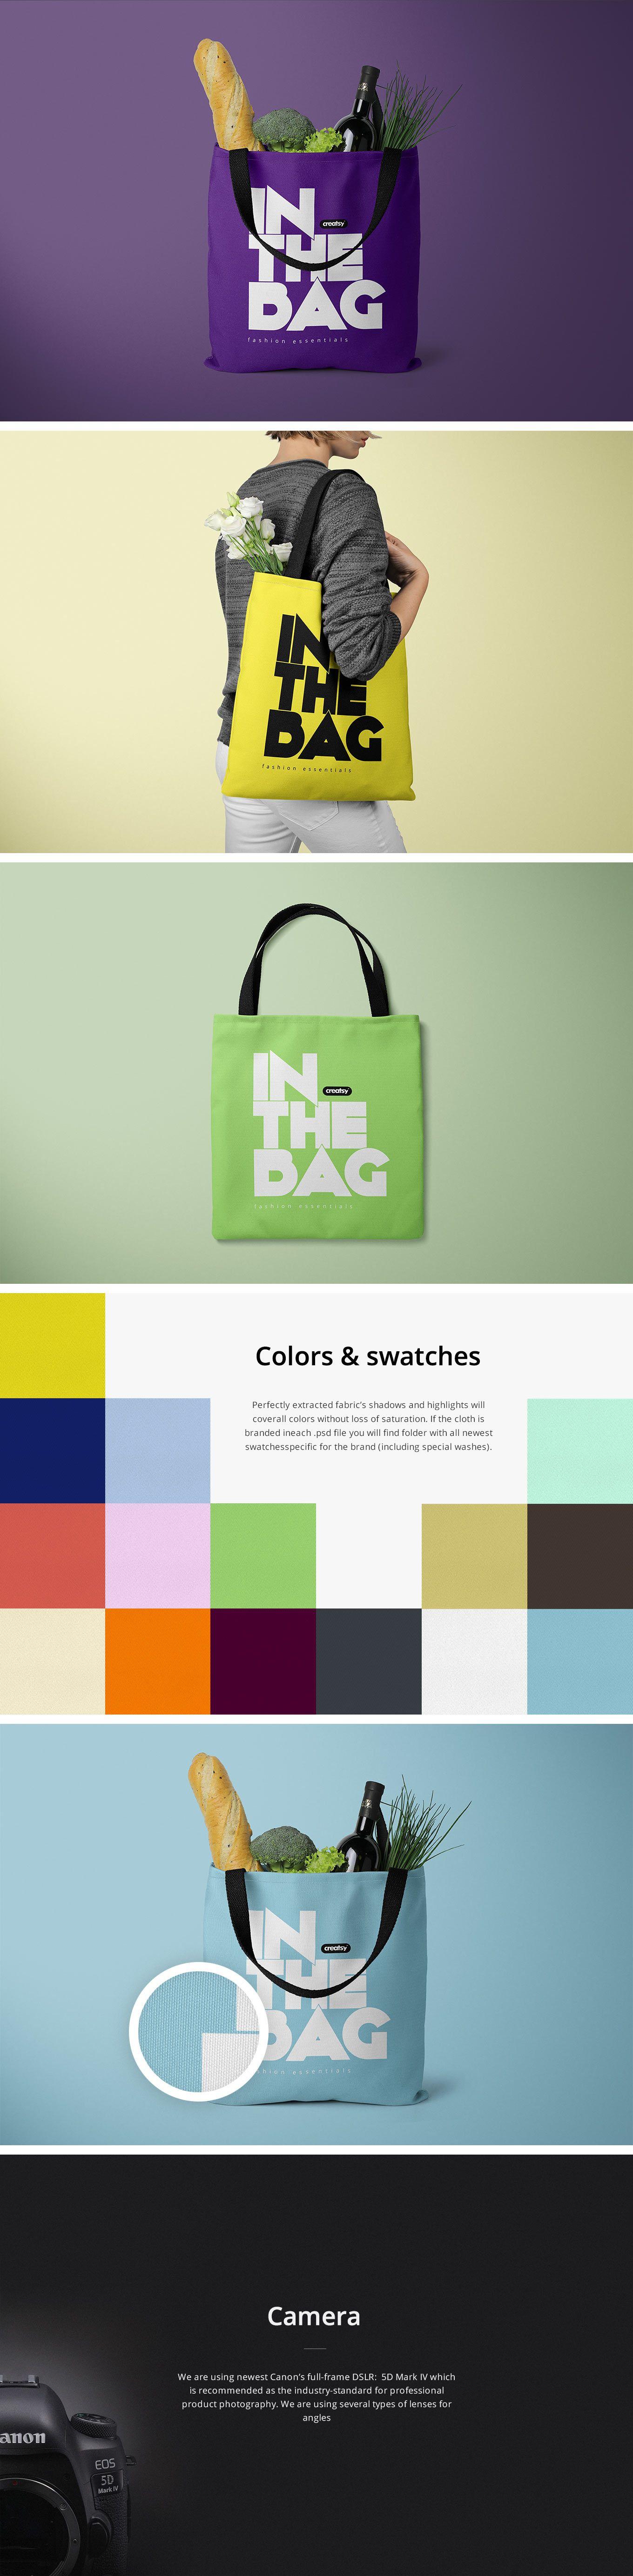 Download Tote Bag Mockups Bag Mockup Mockup Just Letting You Know